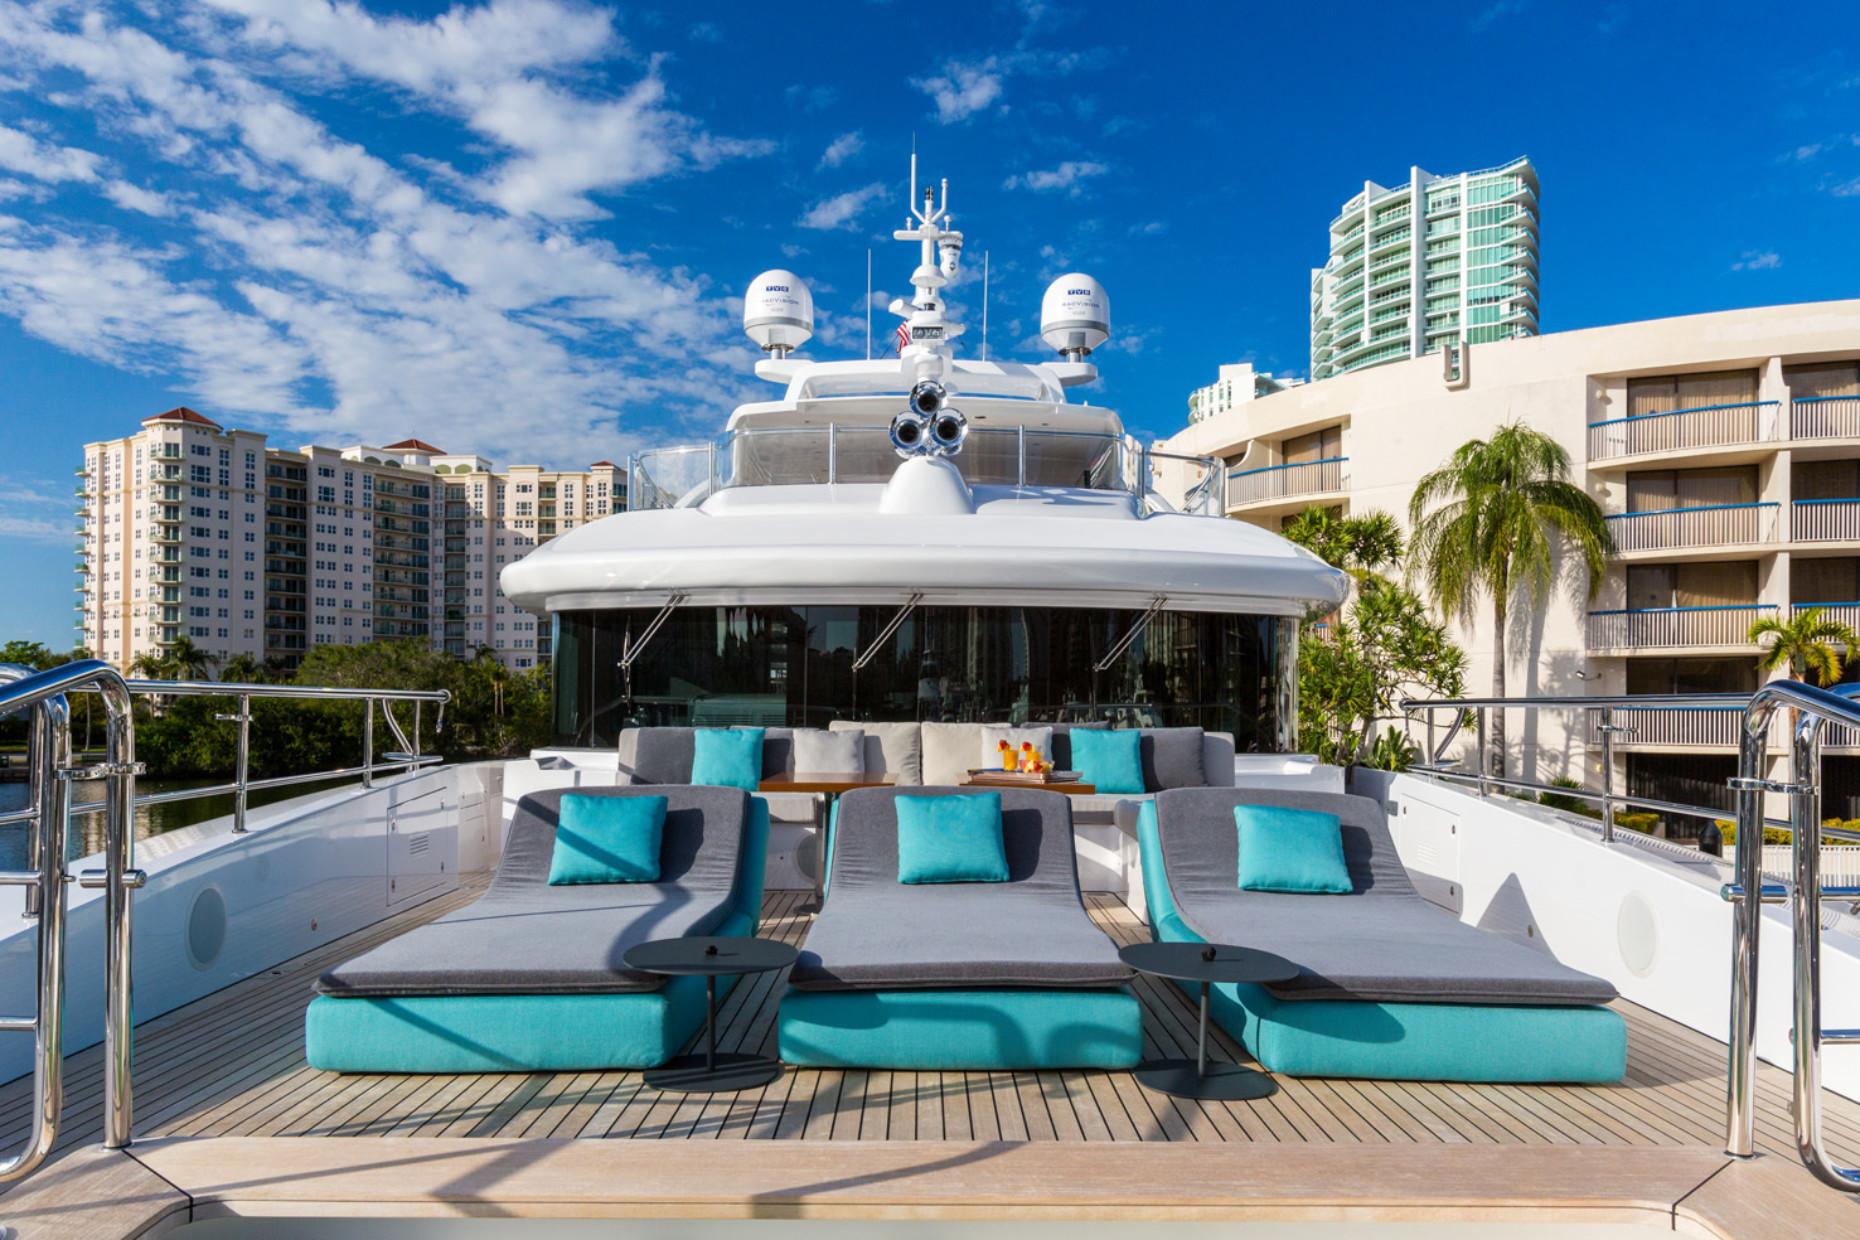 Paola Lenti, Monaco, Boat, Yacht, Stylepark